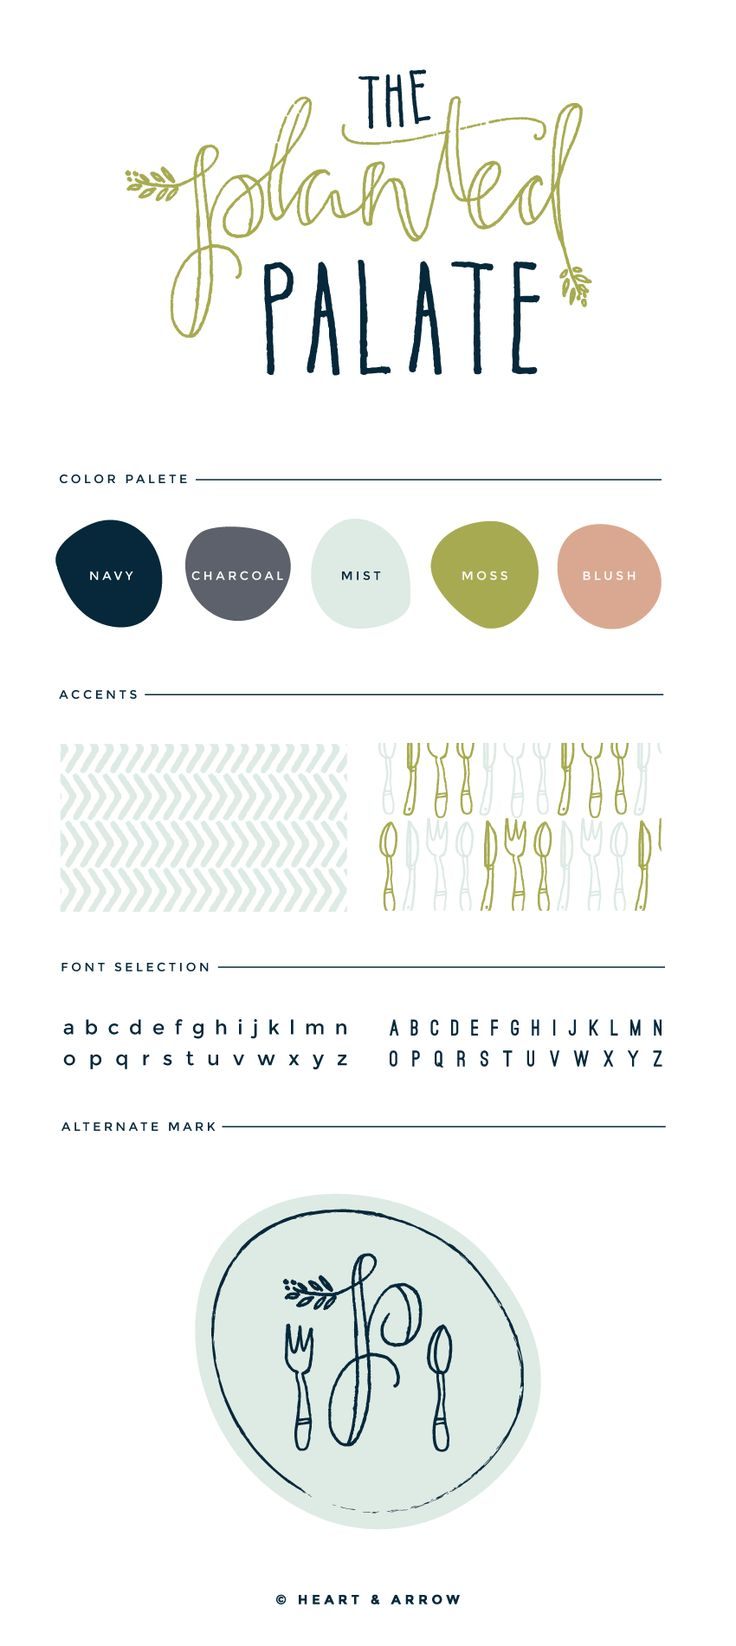 #brandboard #logostyle #blogstylelogo #twocolour #handdrawn #simple #multifont